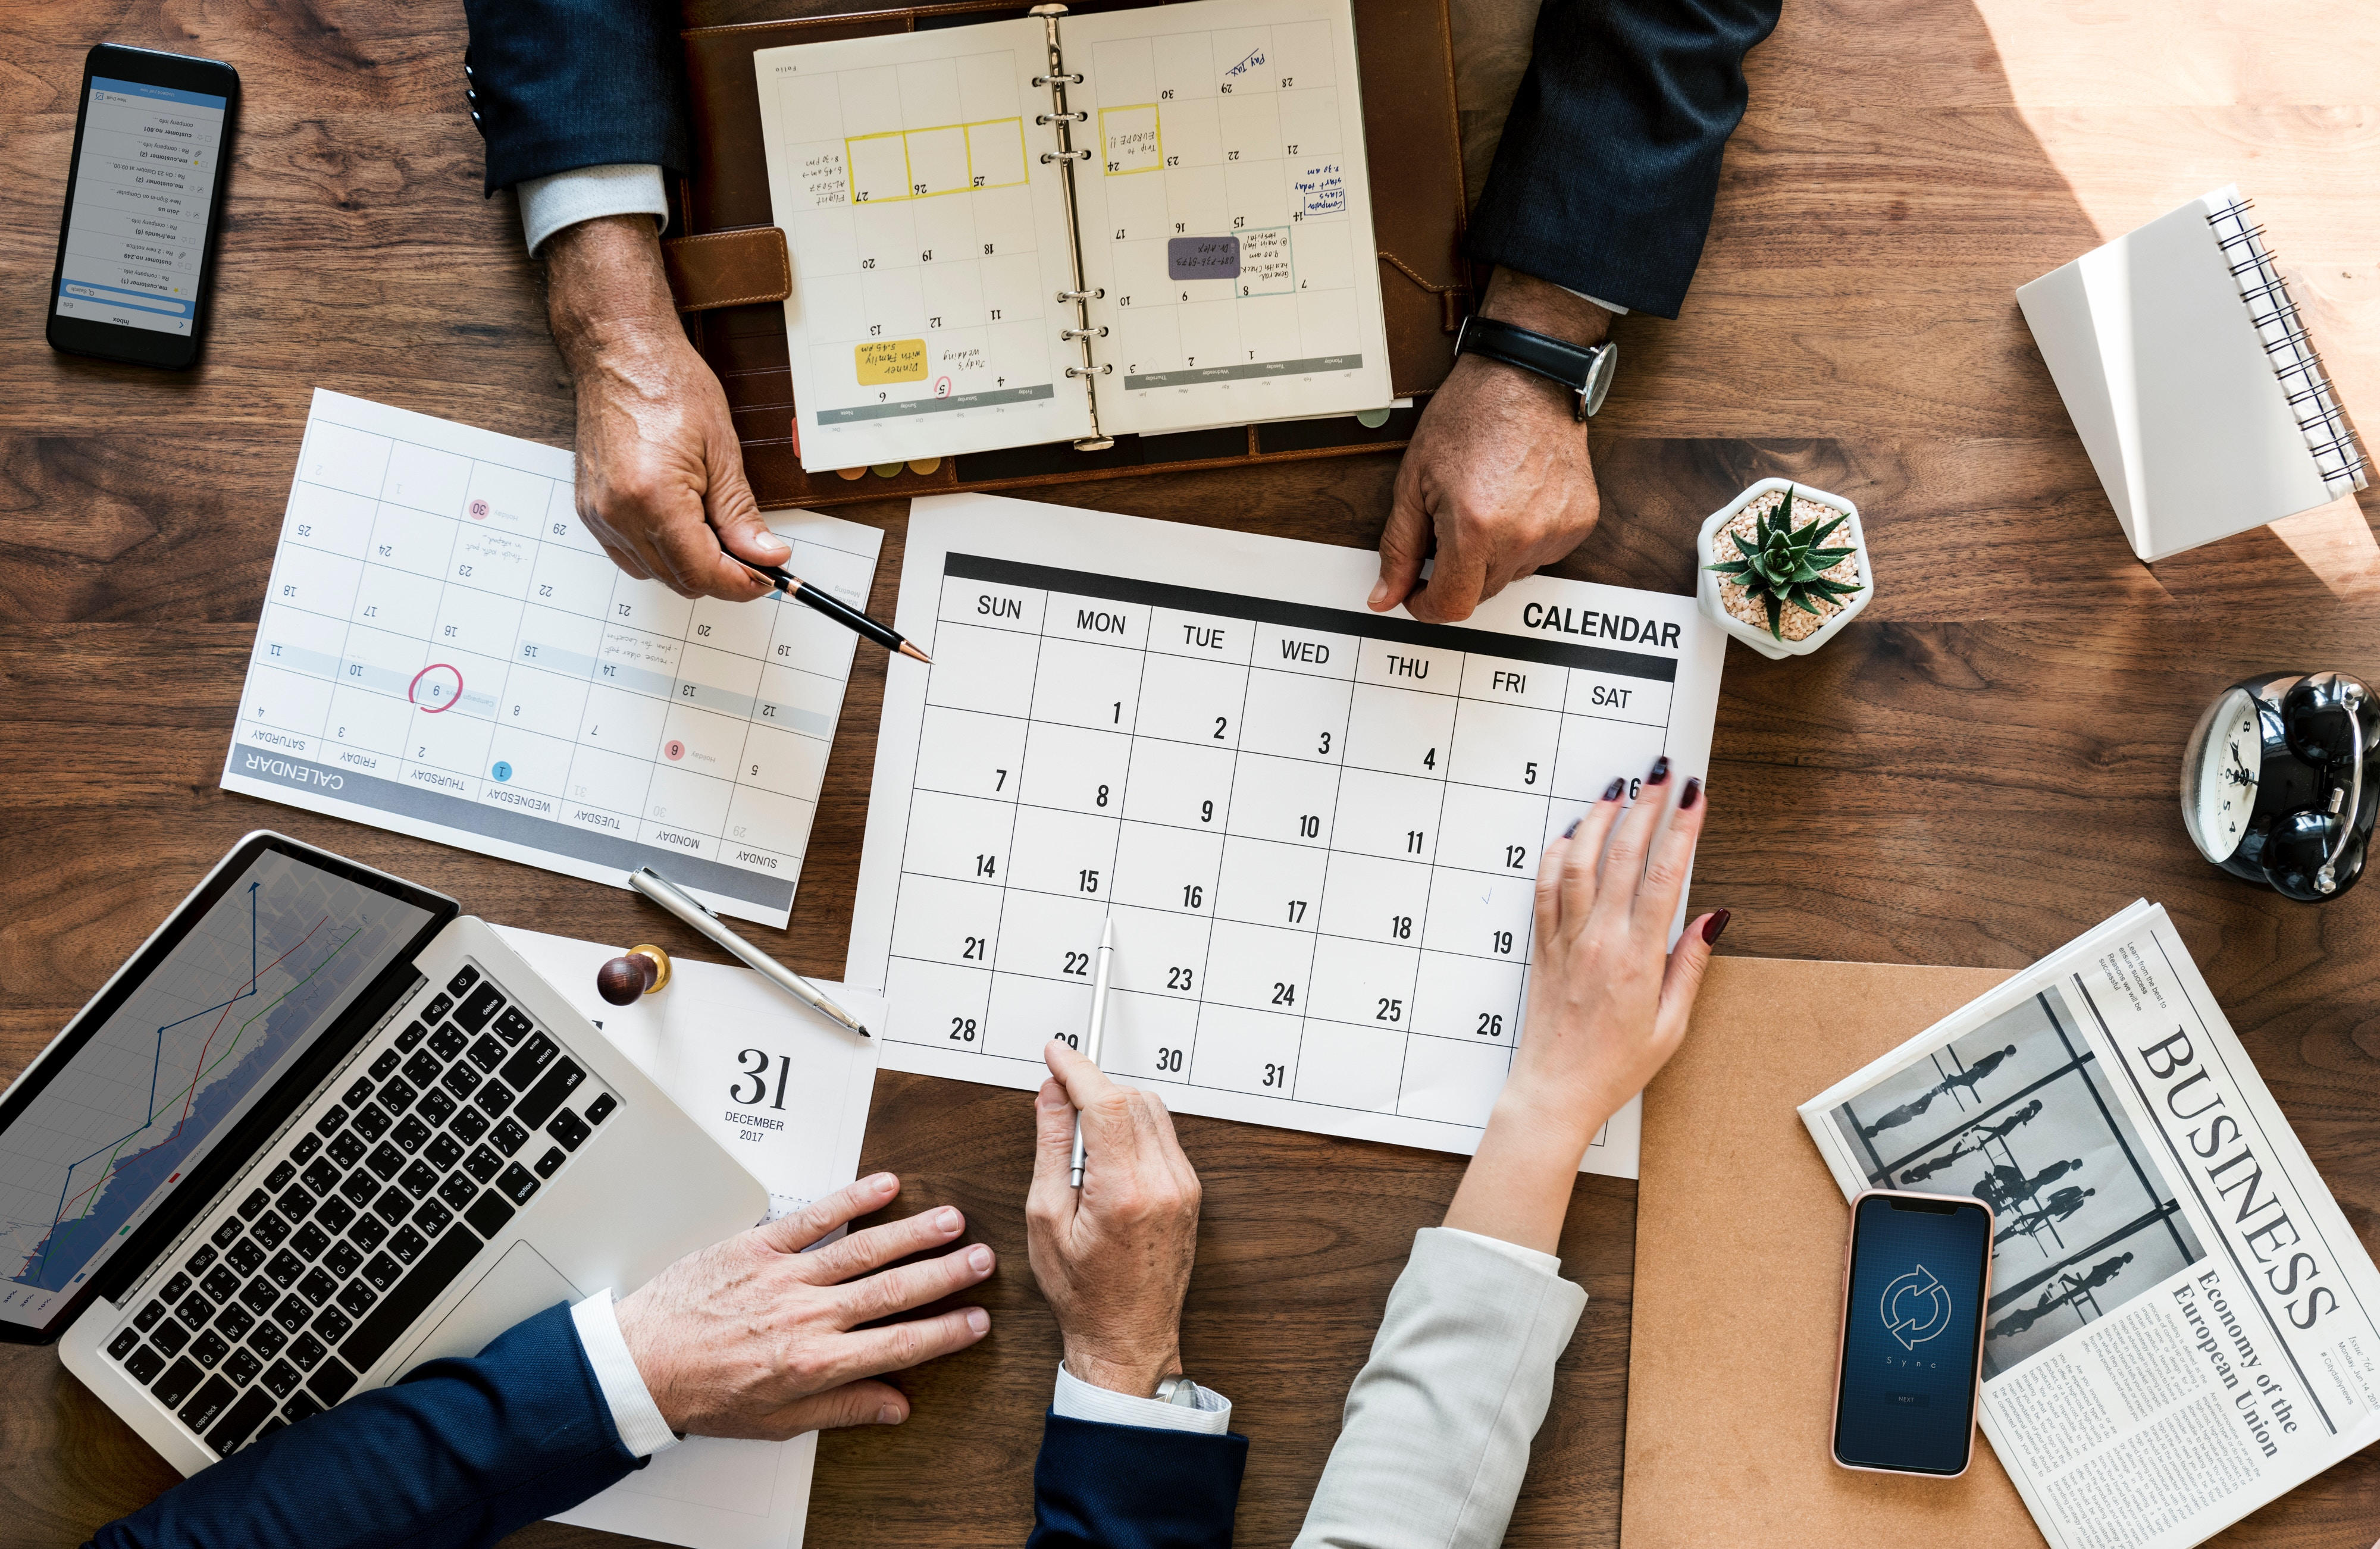 Project management - planning